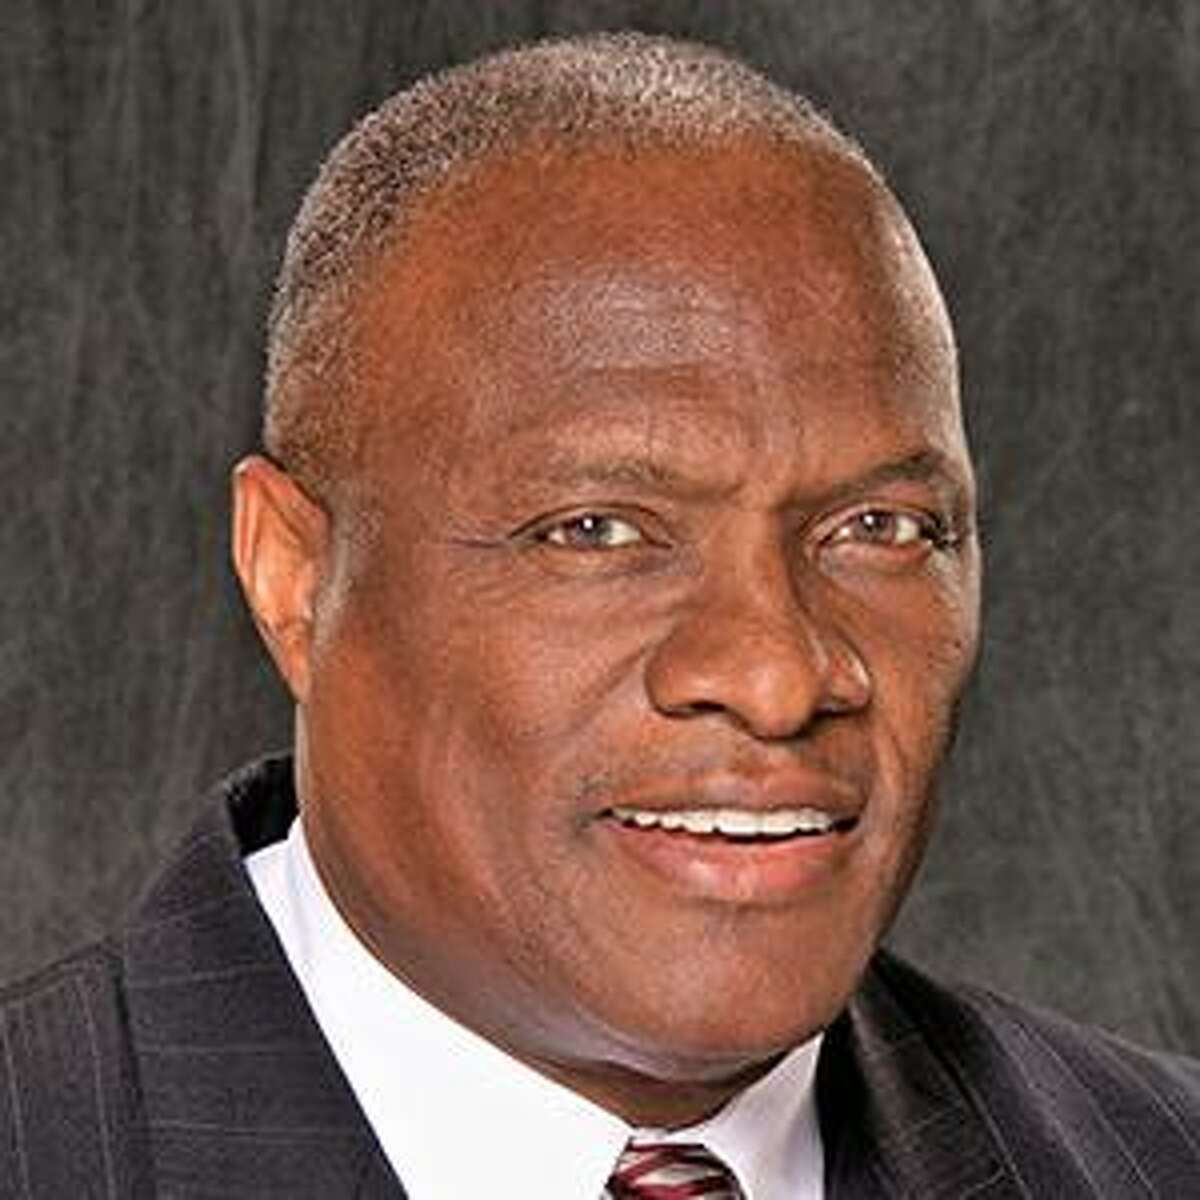 Thomas Coley, regional president of Gateway, Housatonic and Norwalk Community Colleges